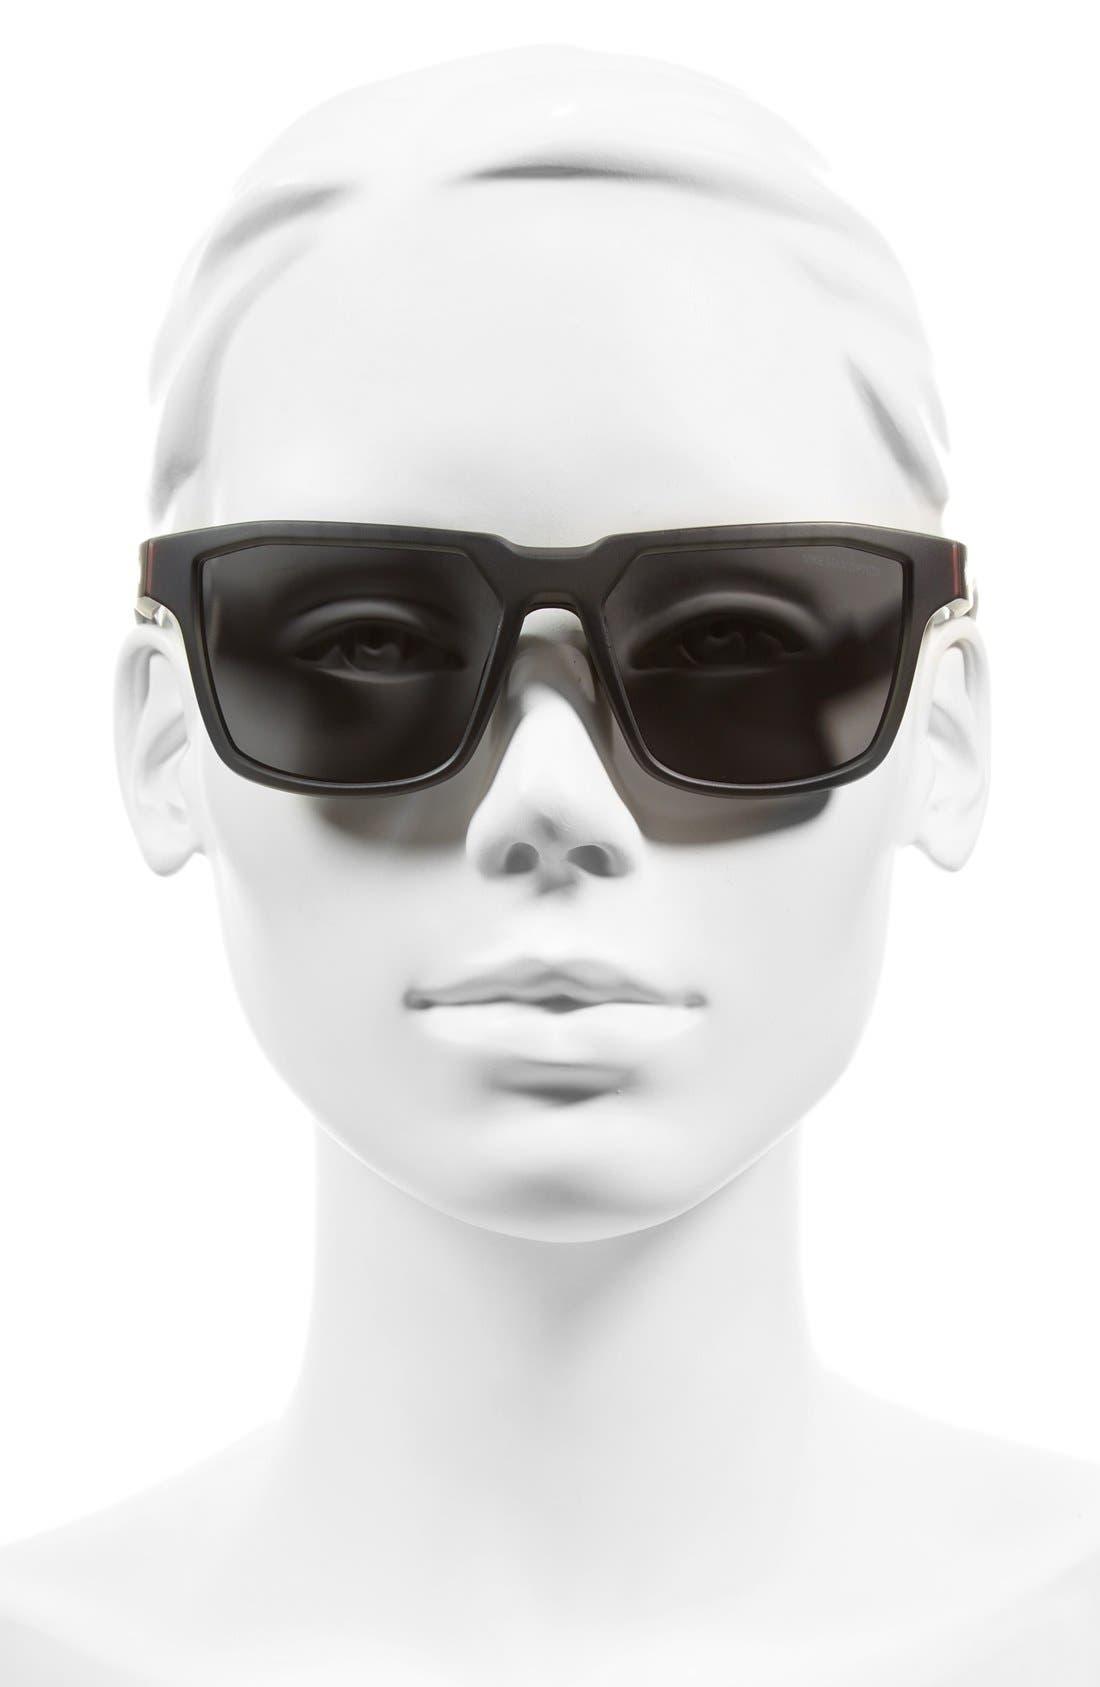 Fleet 55mm Sport Sunglasses,                             Alternate thumbnail 2, color,                             MATTE ANTHRACITE